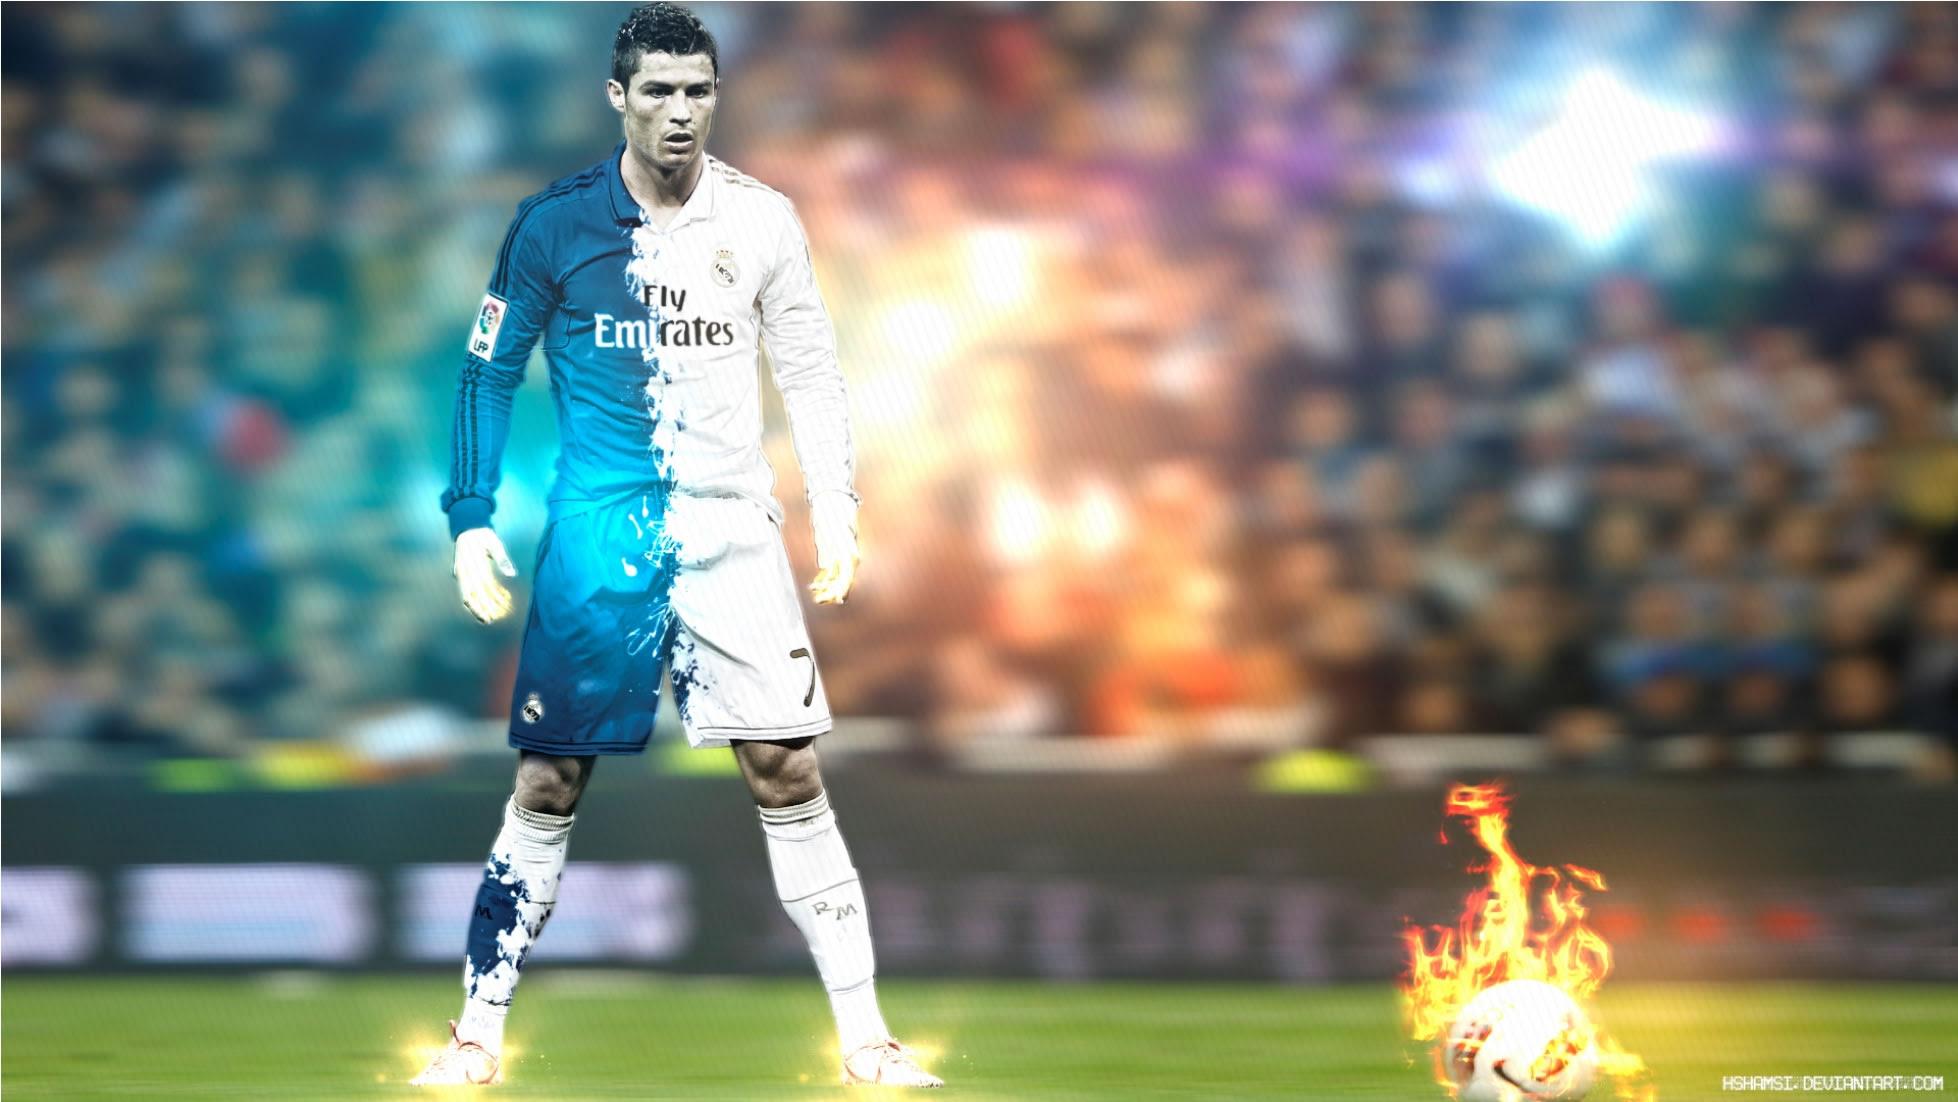 Unduh 200 Wallpaper Android Ronaldo Hd HD Terbaru